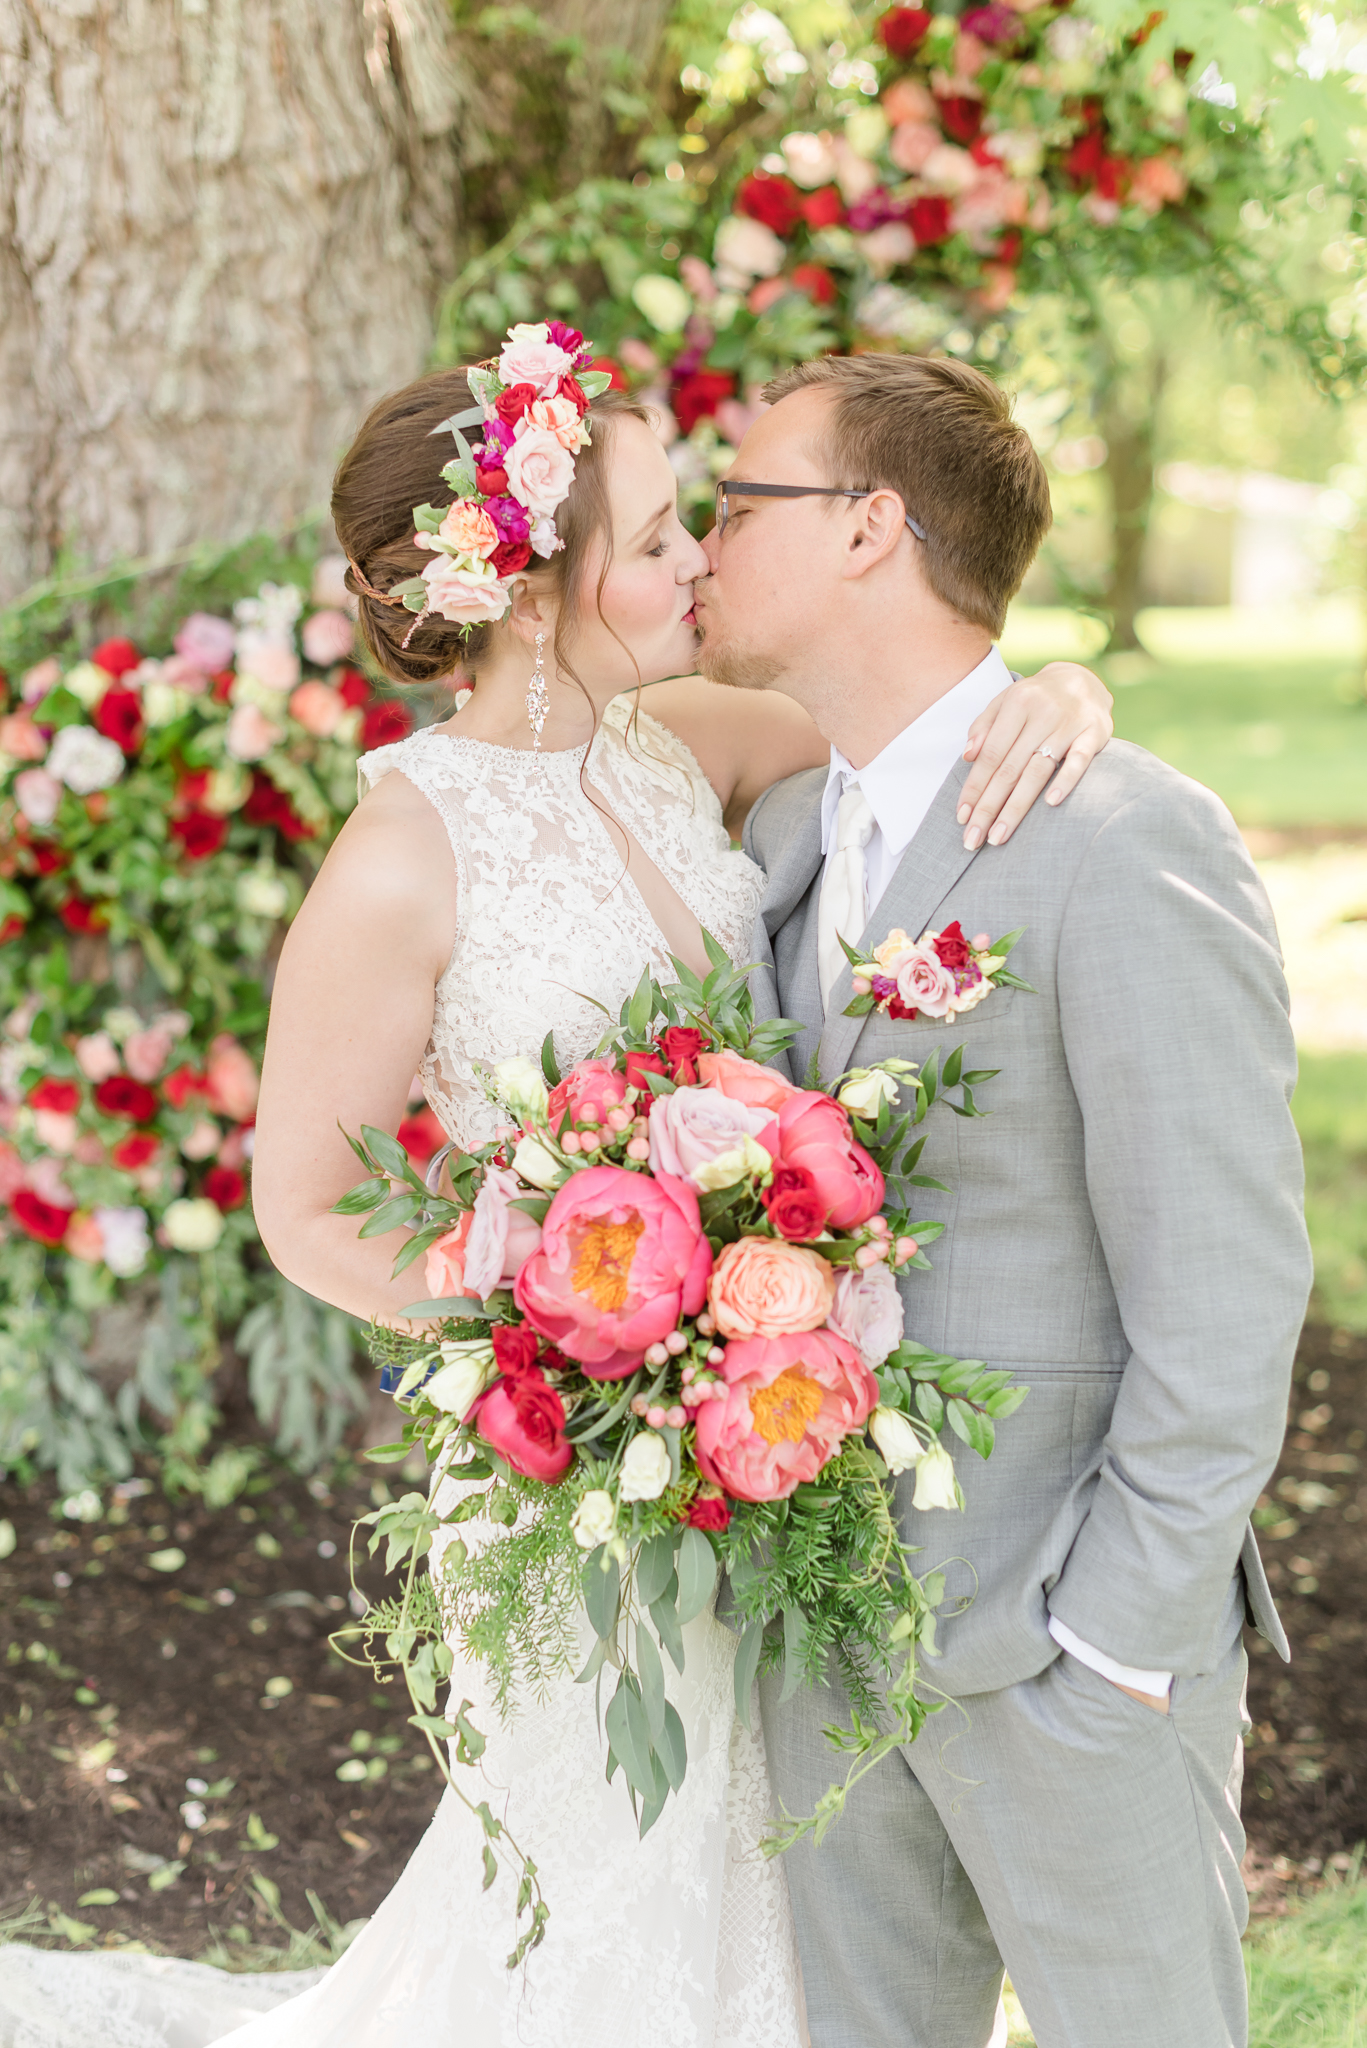 Mustard Seed Gardens Wedding Indianapolis Noblesvile Fishers Wedding Photographer-24.jpg